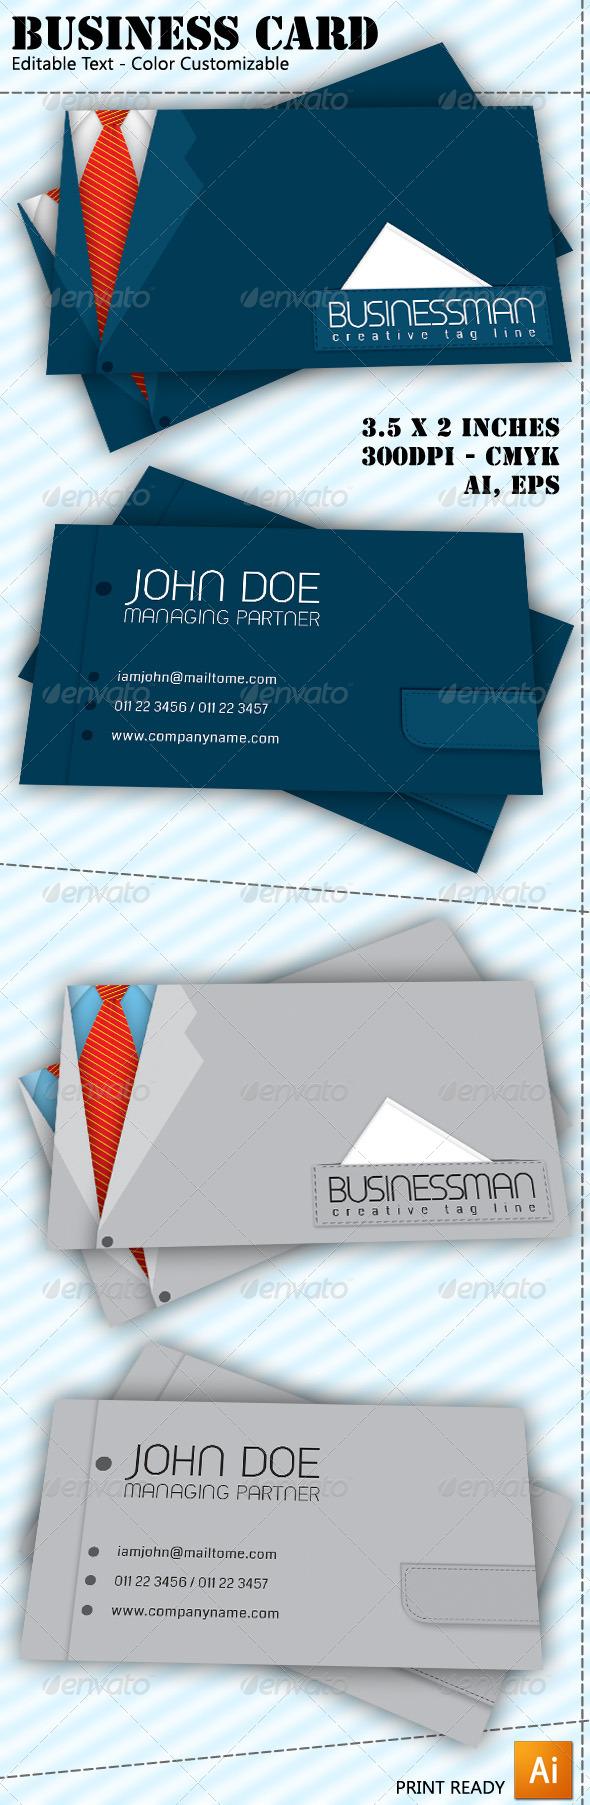 Businessman Business Card - Corporate Business Cards